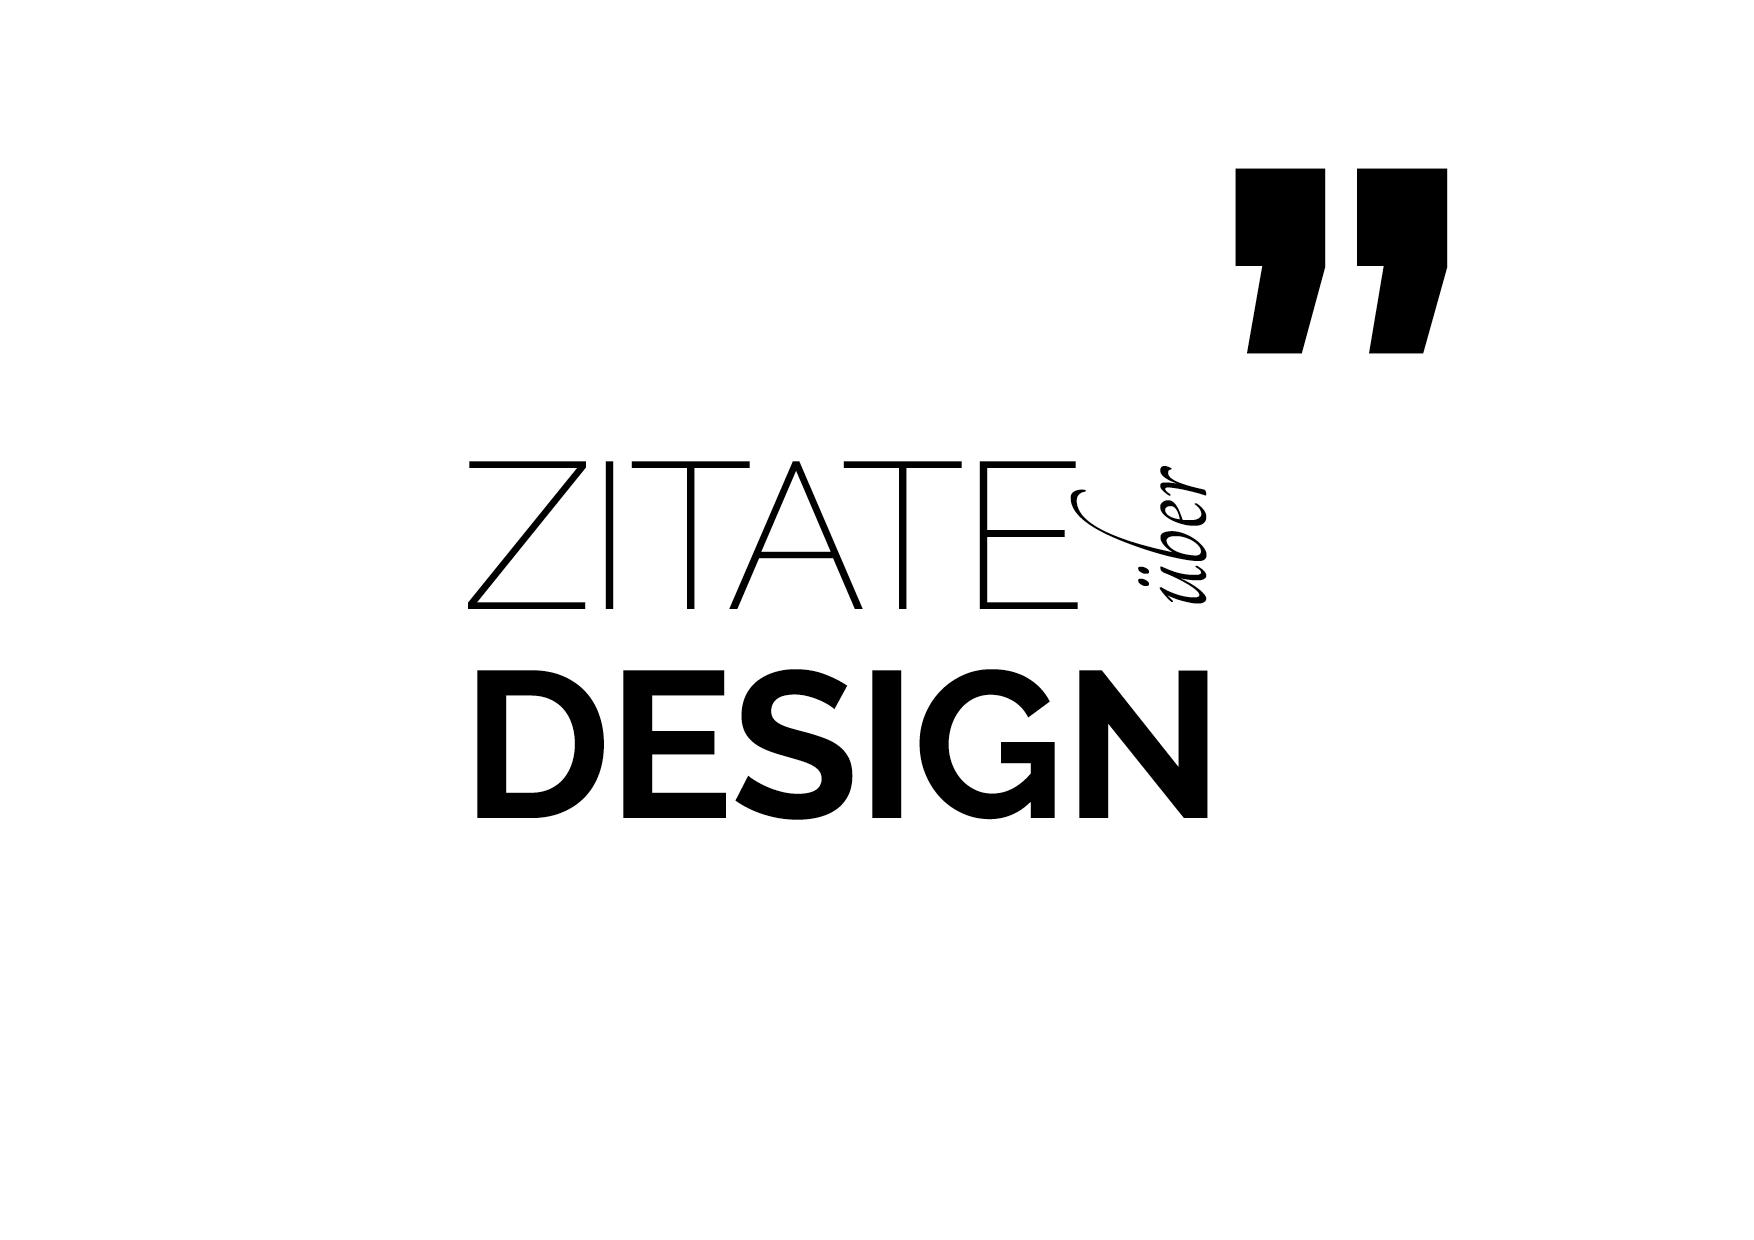 Zitate design design foto cornelefant - Design zitate ...